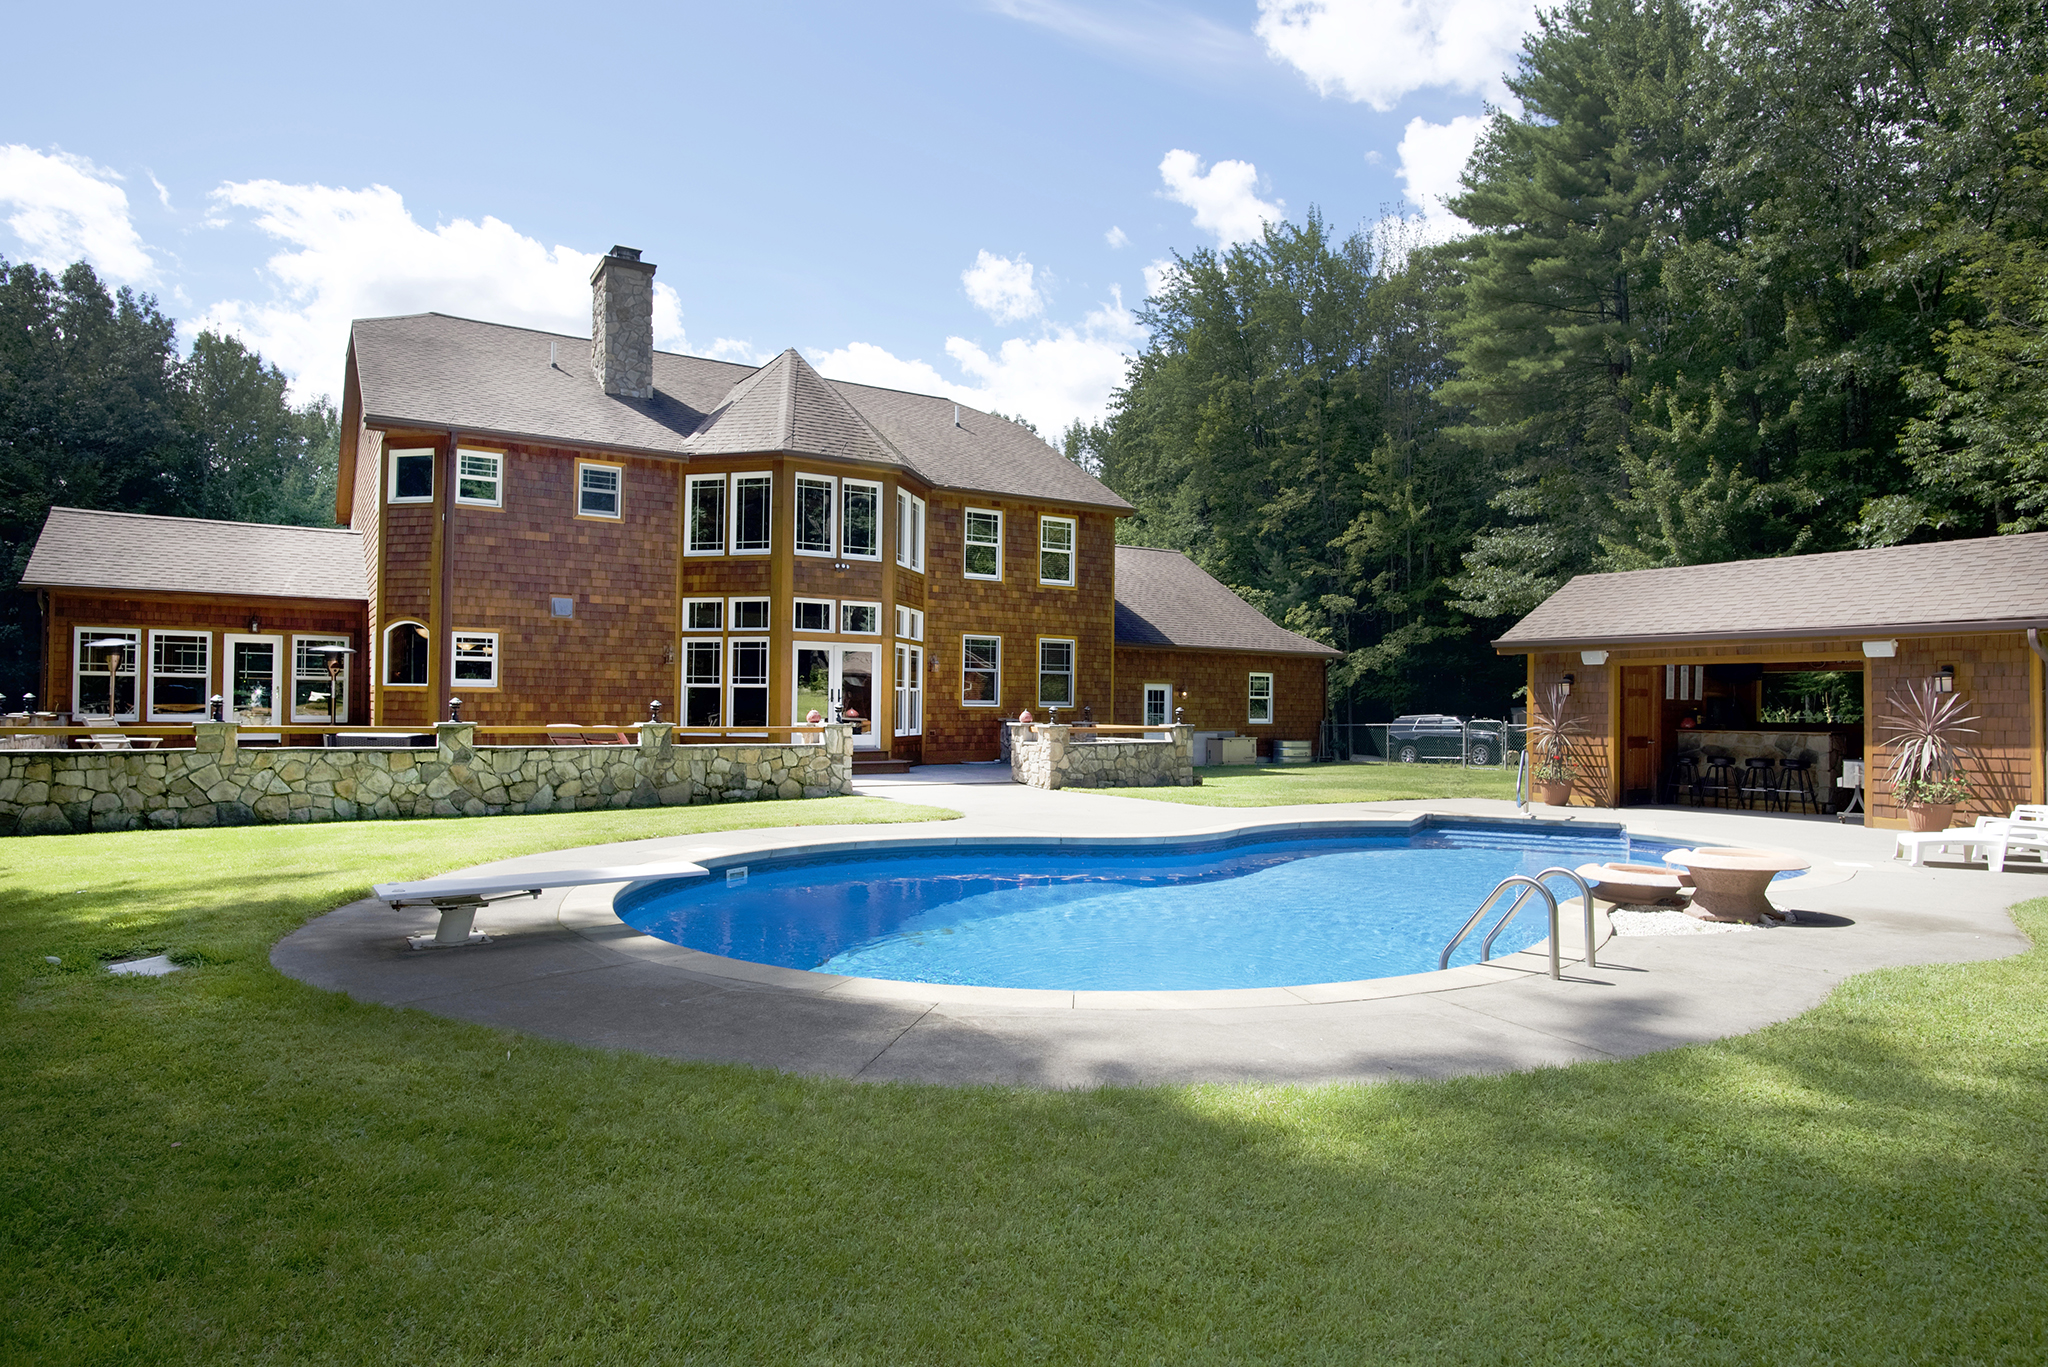 backyard house pool view.jpg